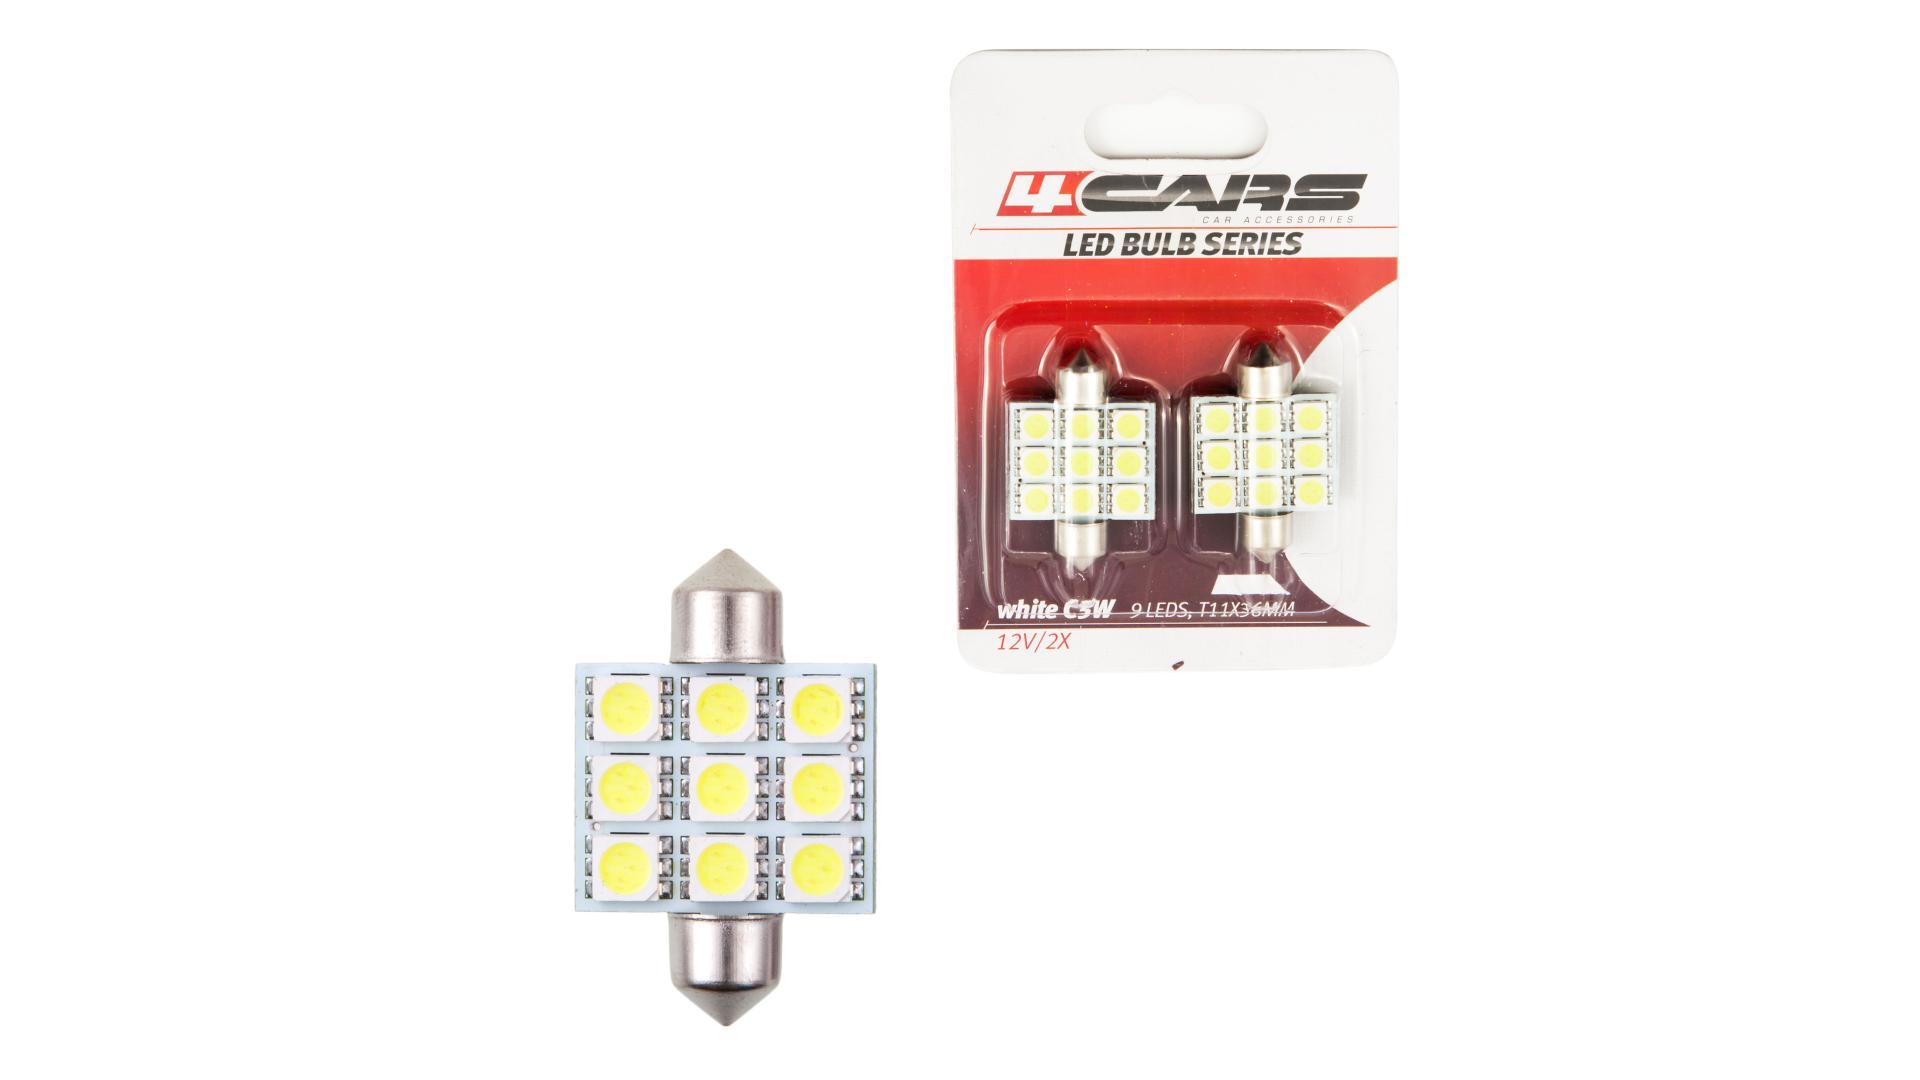 4CARS LED žárovka 9LED 12V Festoon 5050SMD T11x36mm